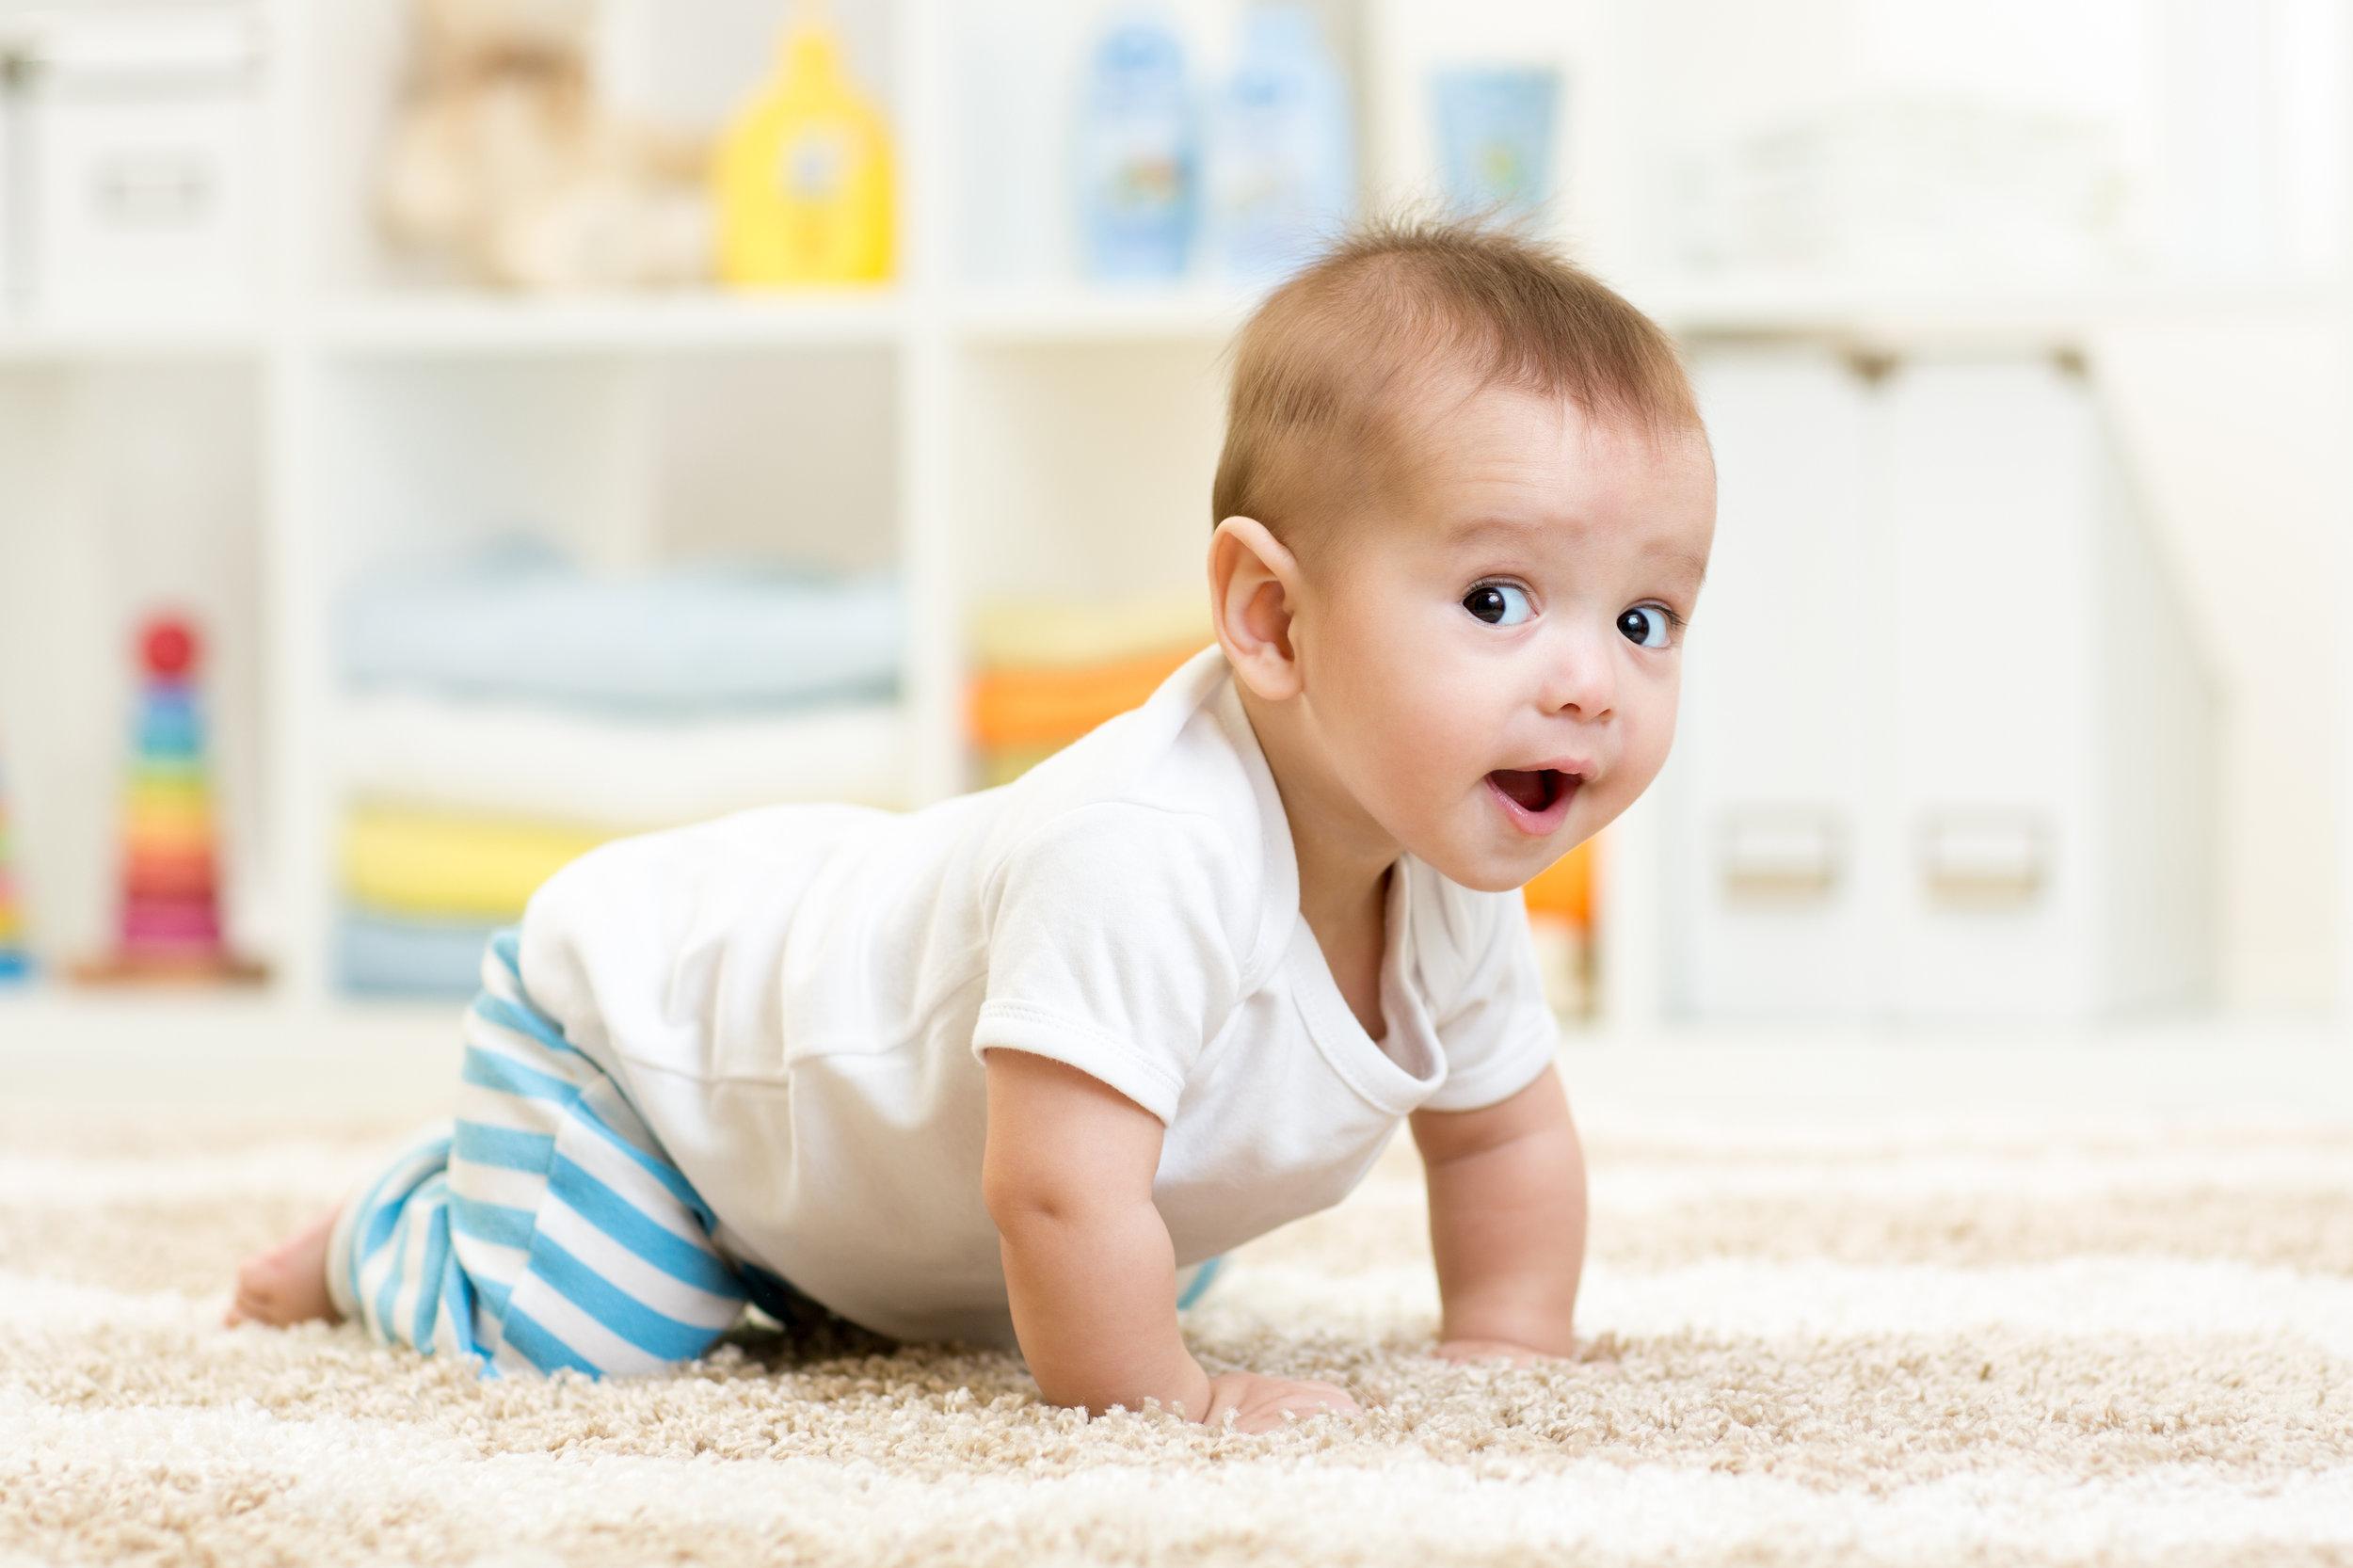 crawling_baby_boy_indoors.jpeg